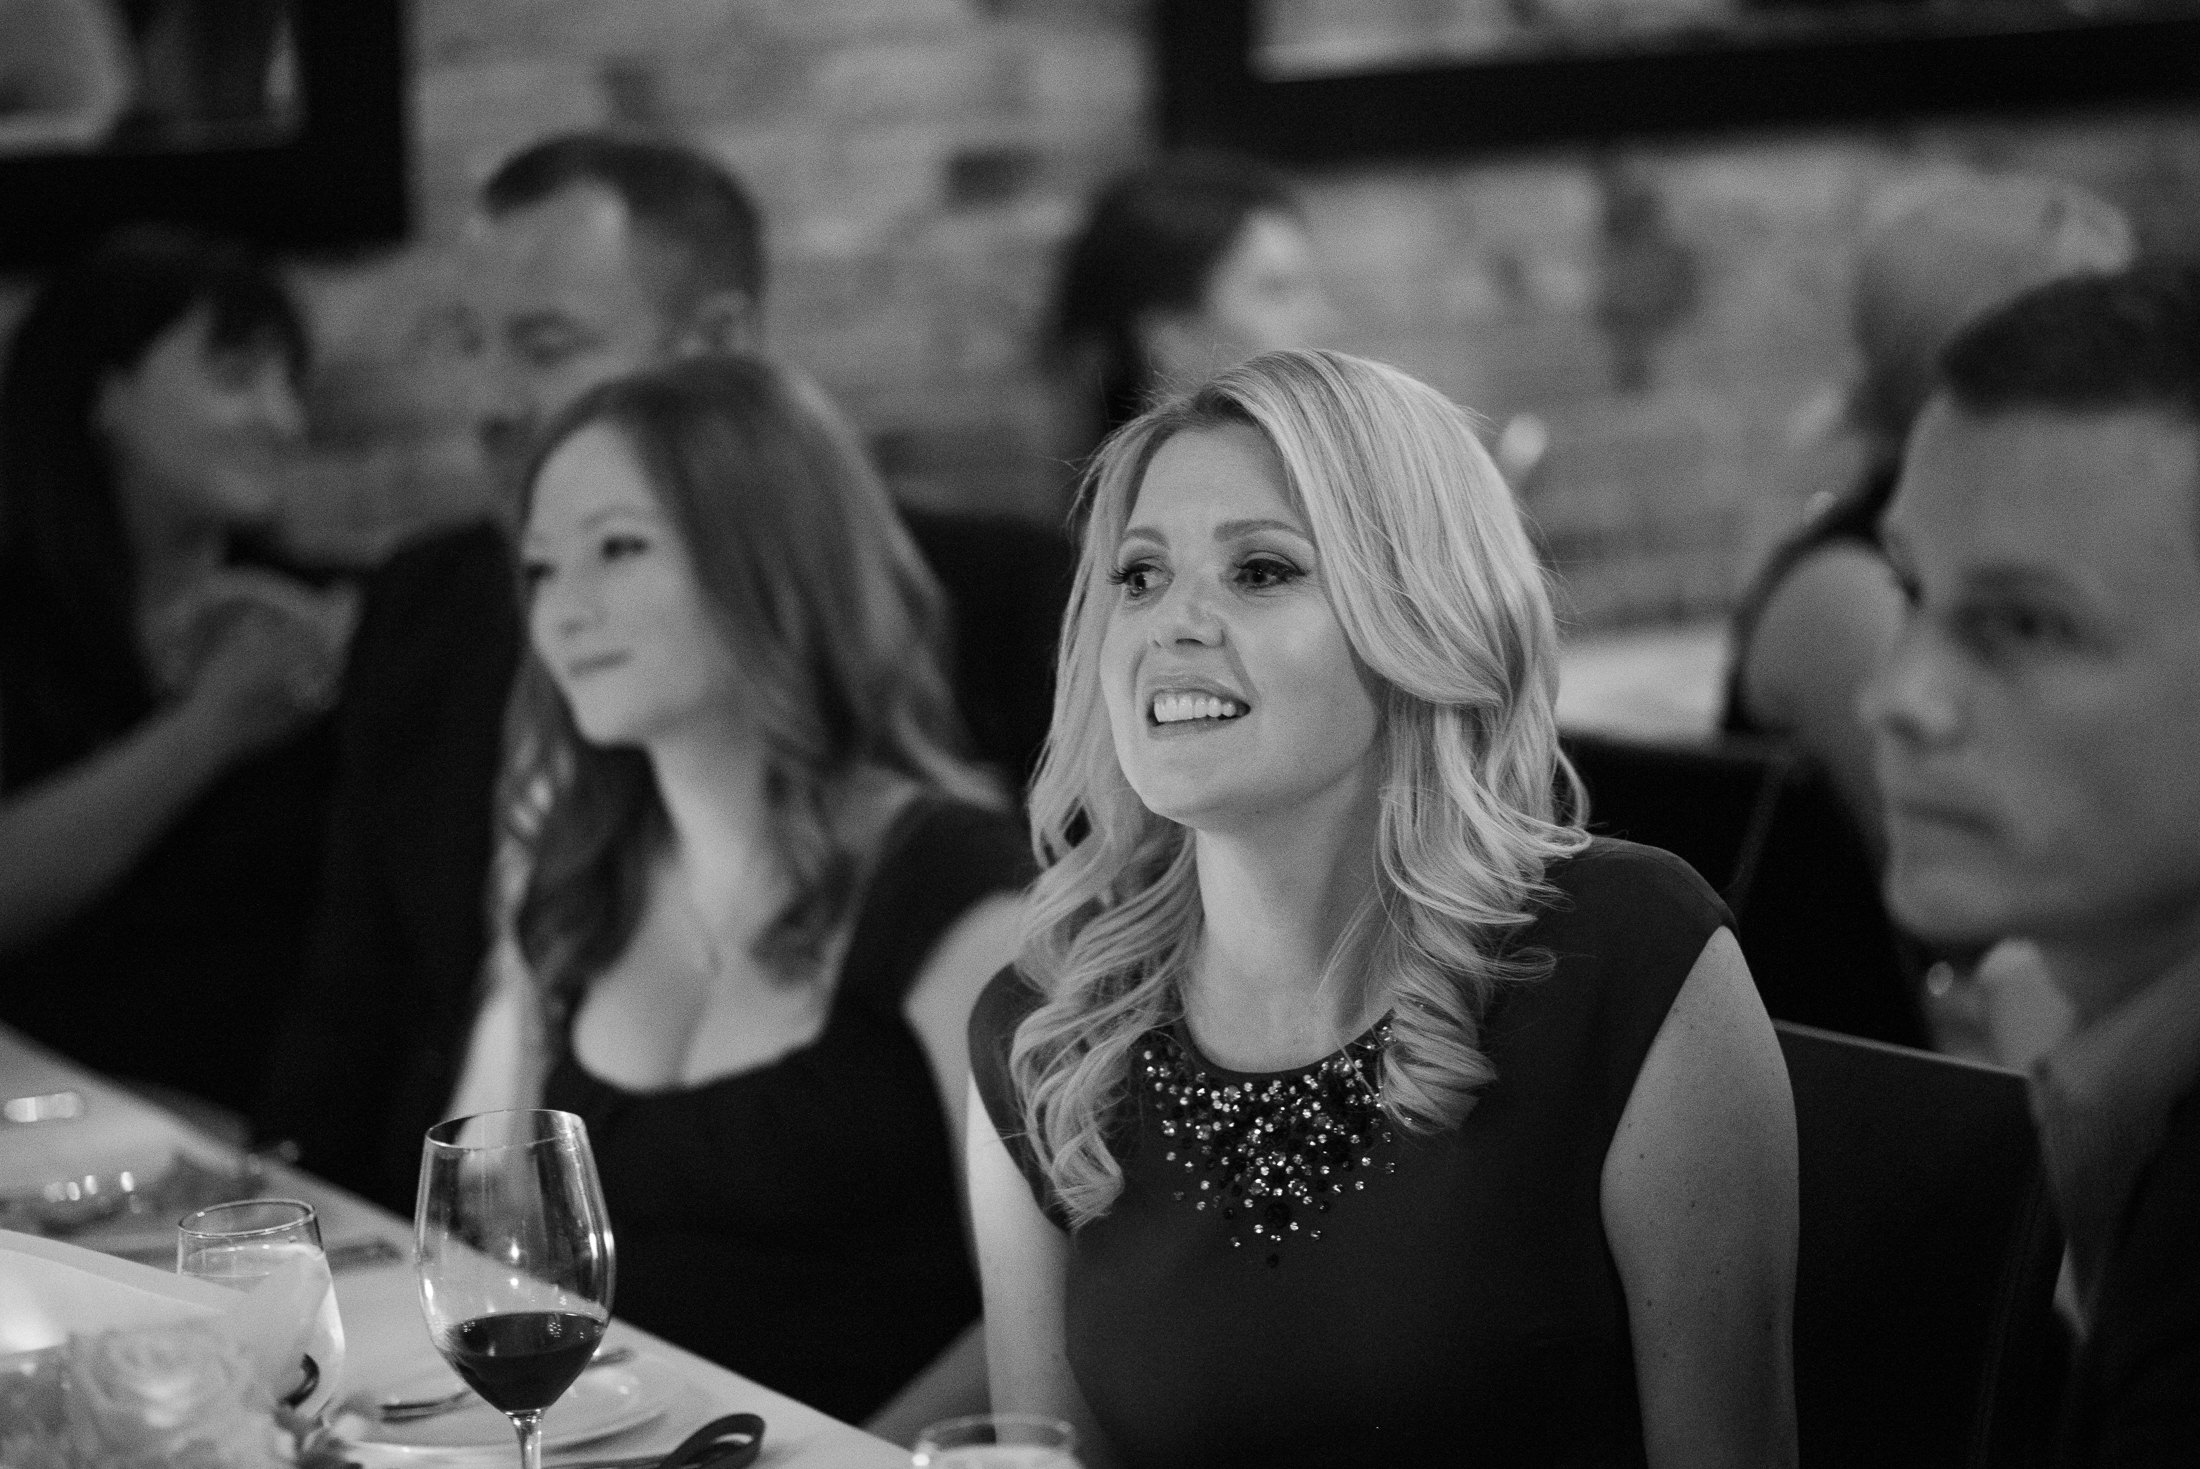 black and white wedding photos vancouver wedding reception at brix